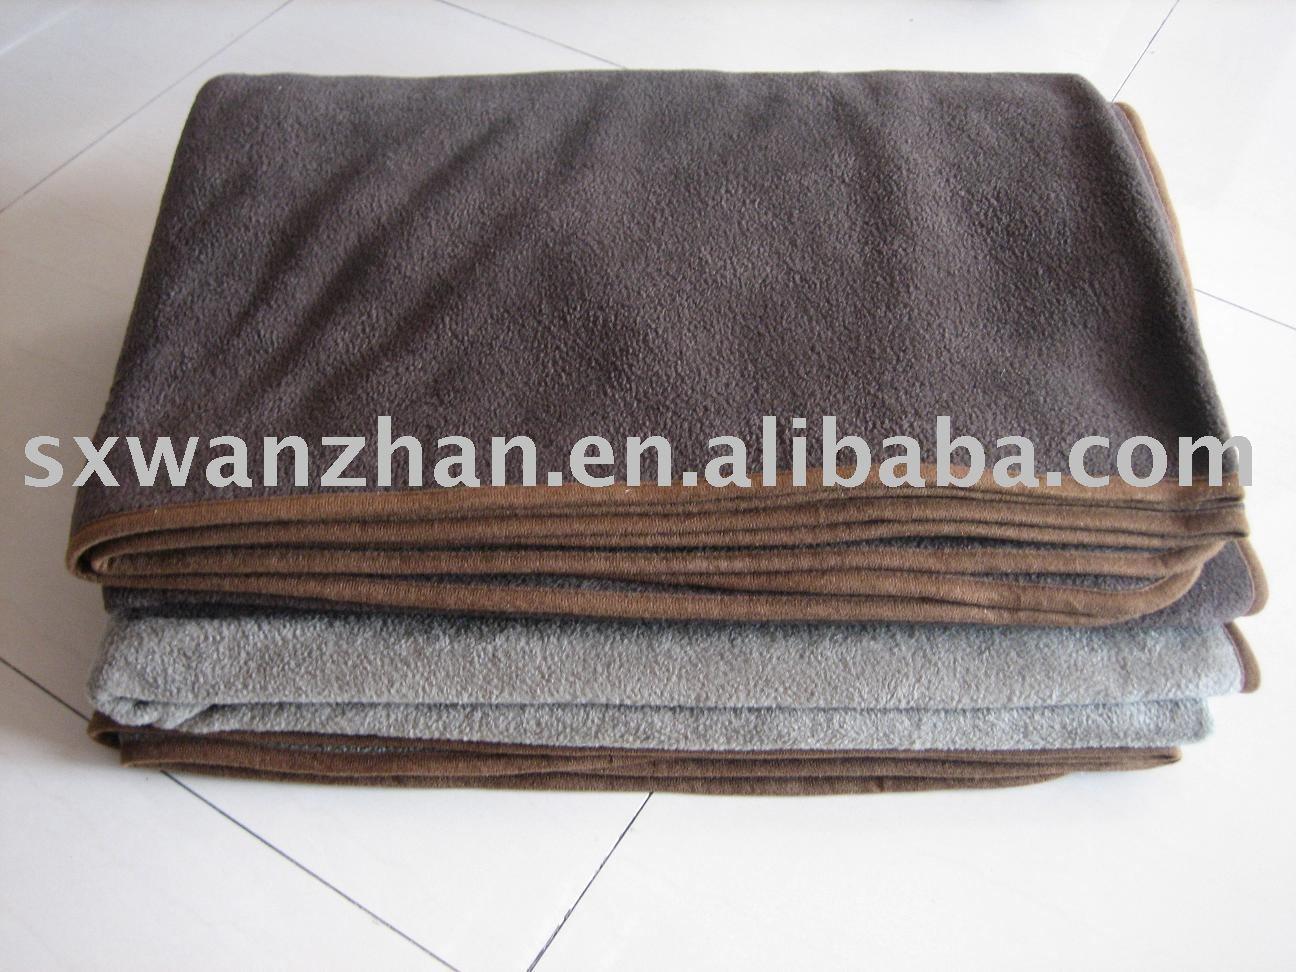 Making Fleece Baby Blankets With Knots Cuddly Fleece Baby Blanket